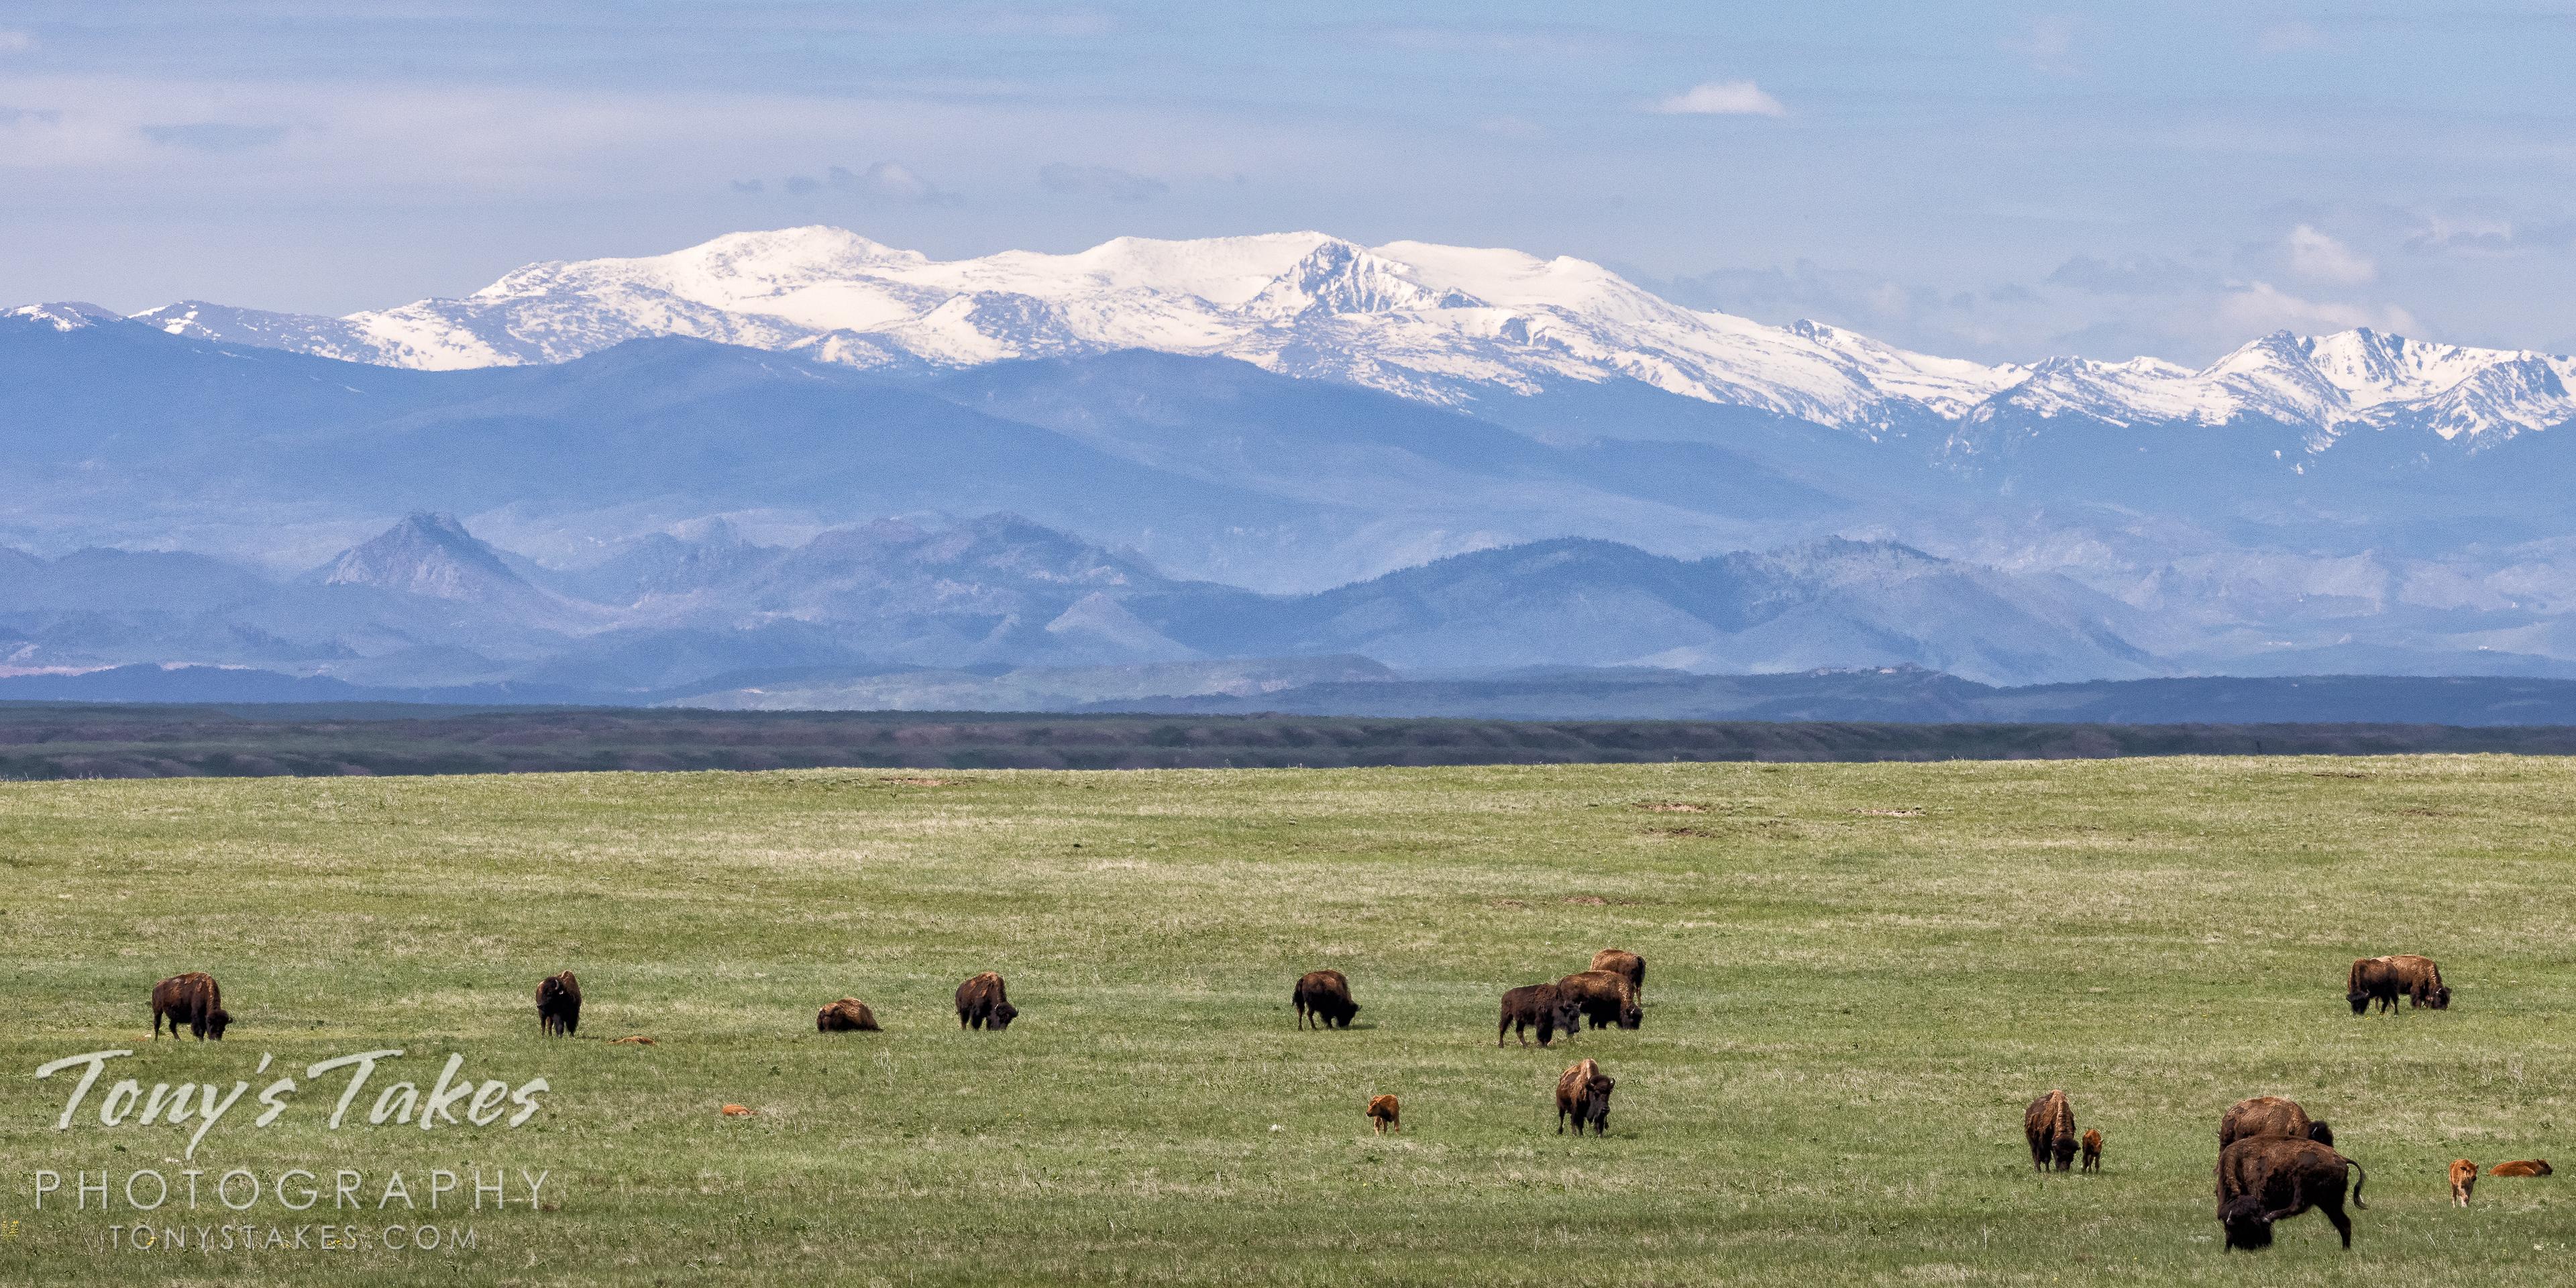 Bison at home on the range on Tatanka Tuesday